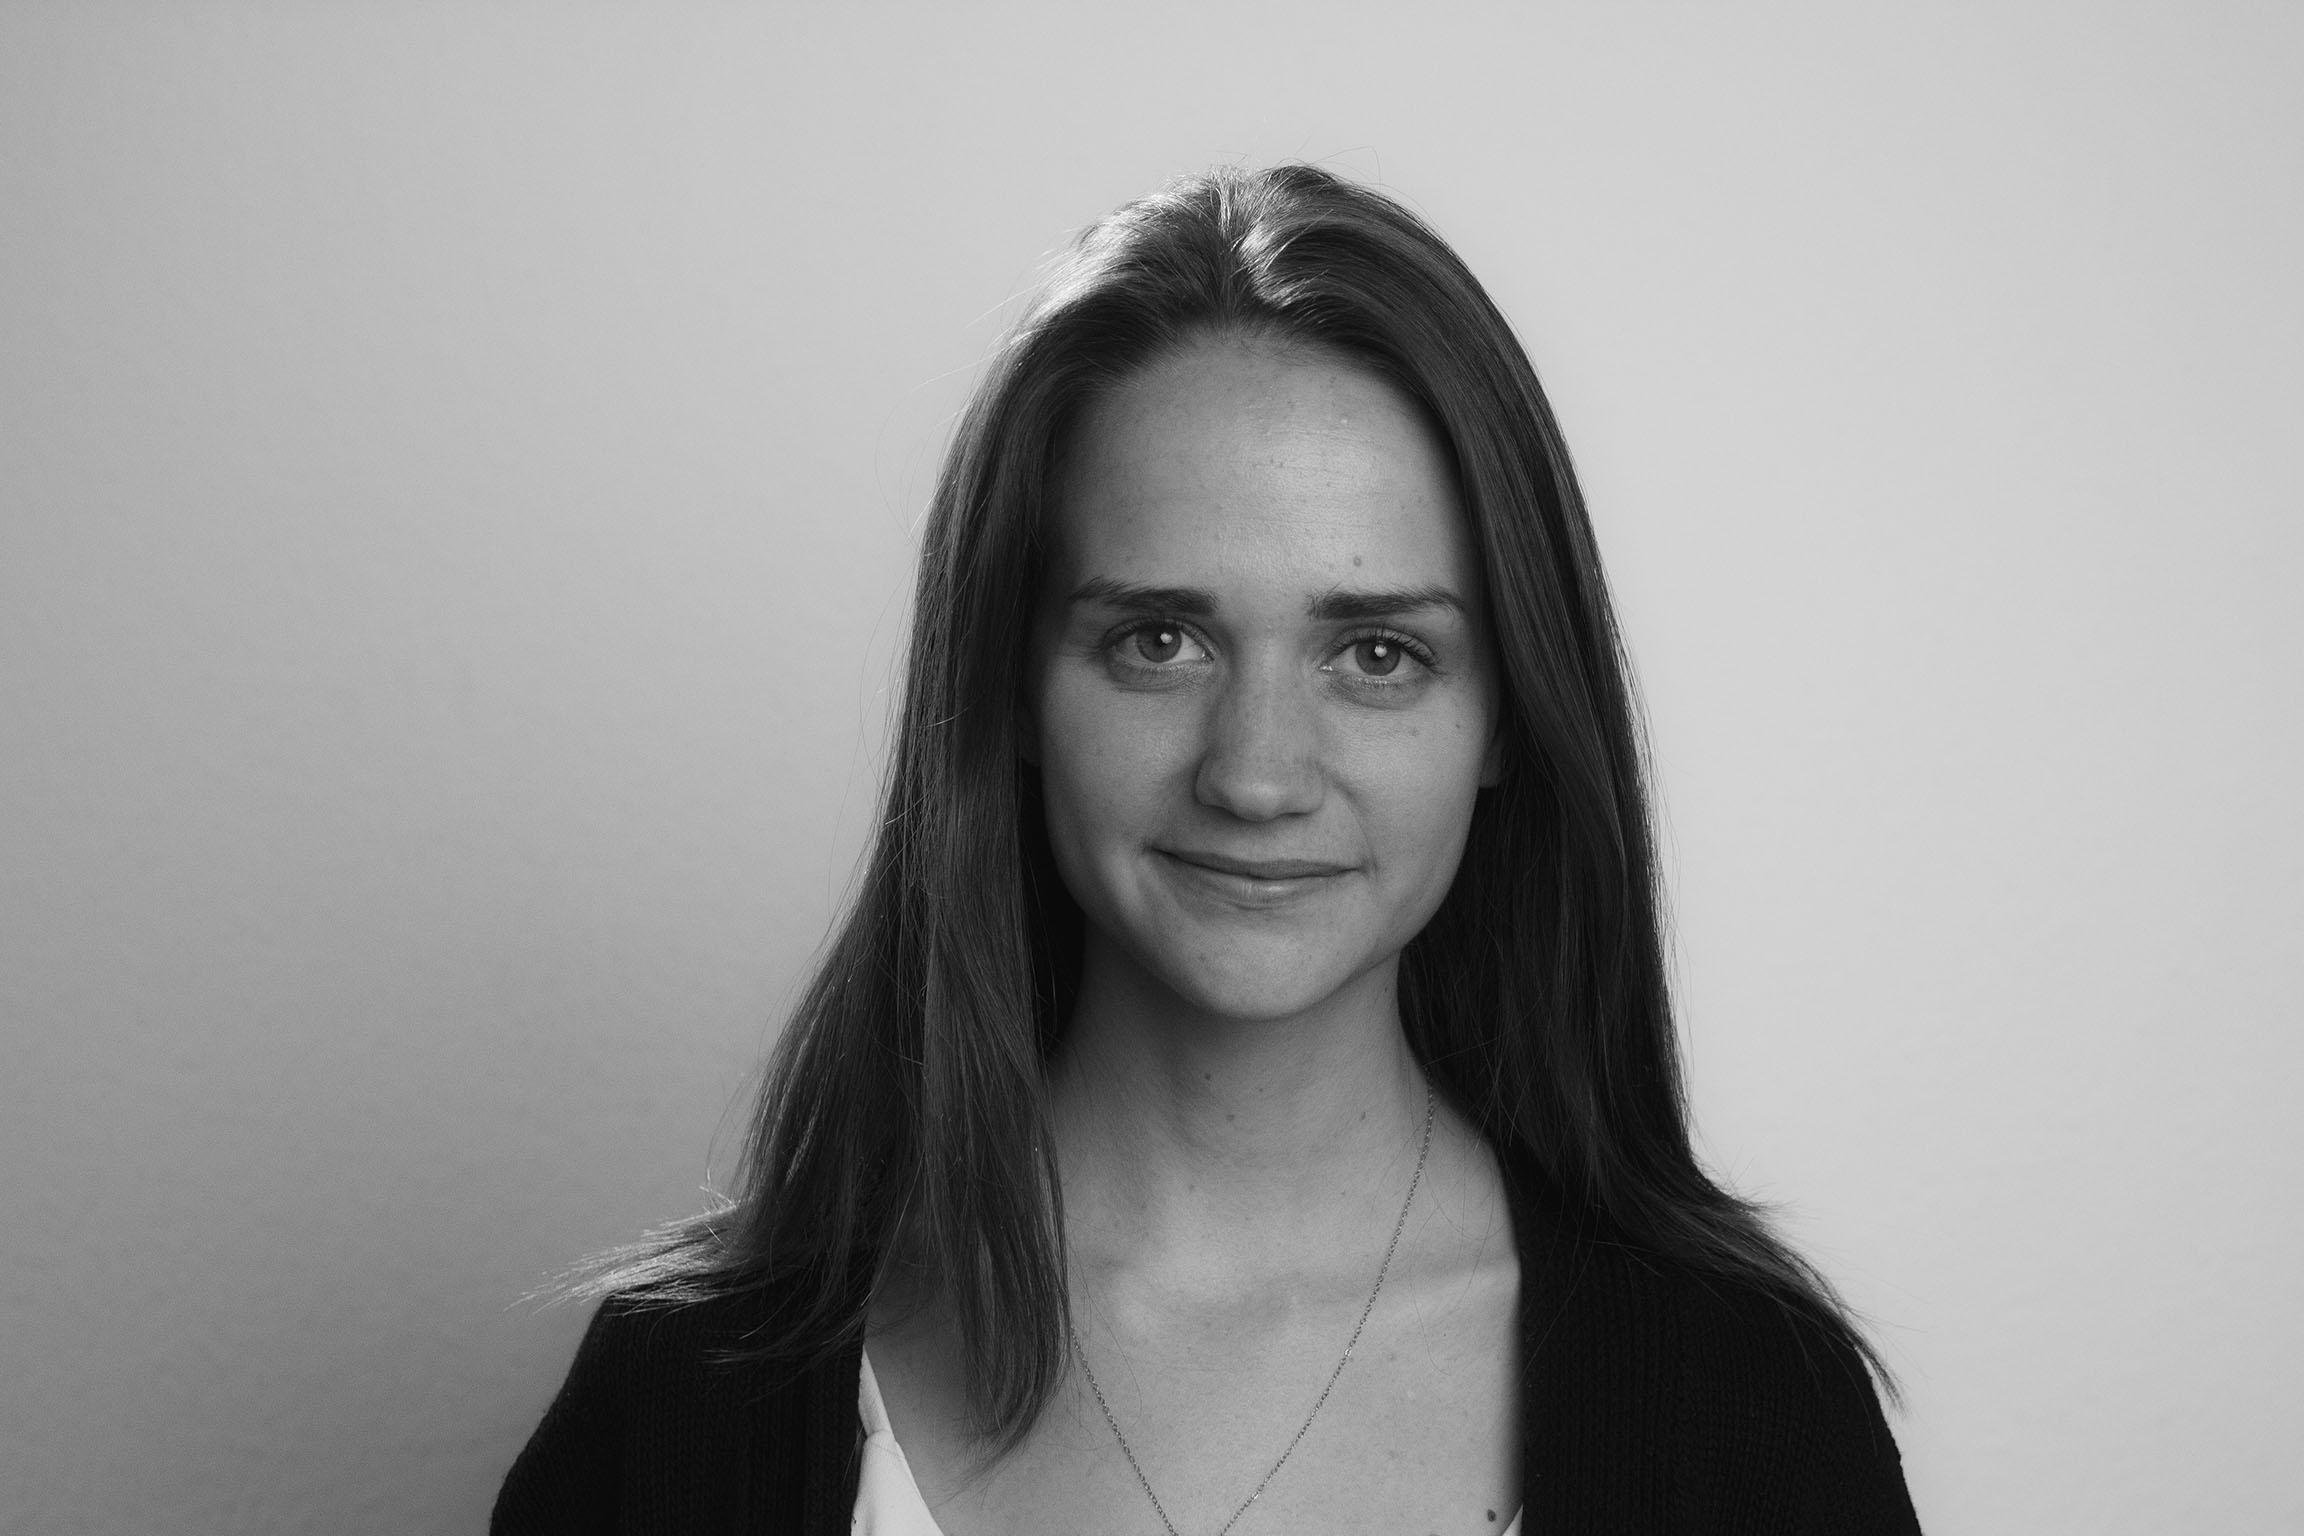 Julia Berewinkel